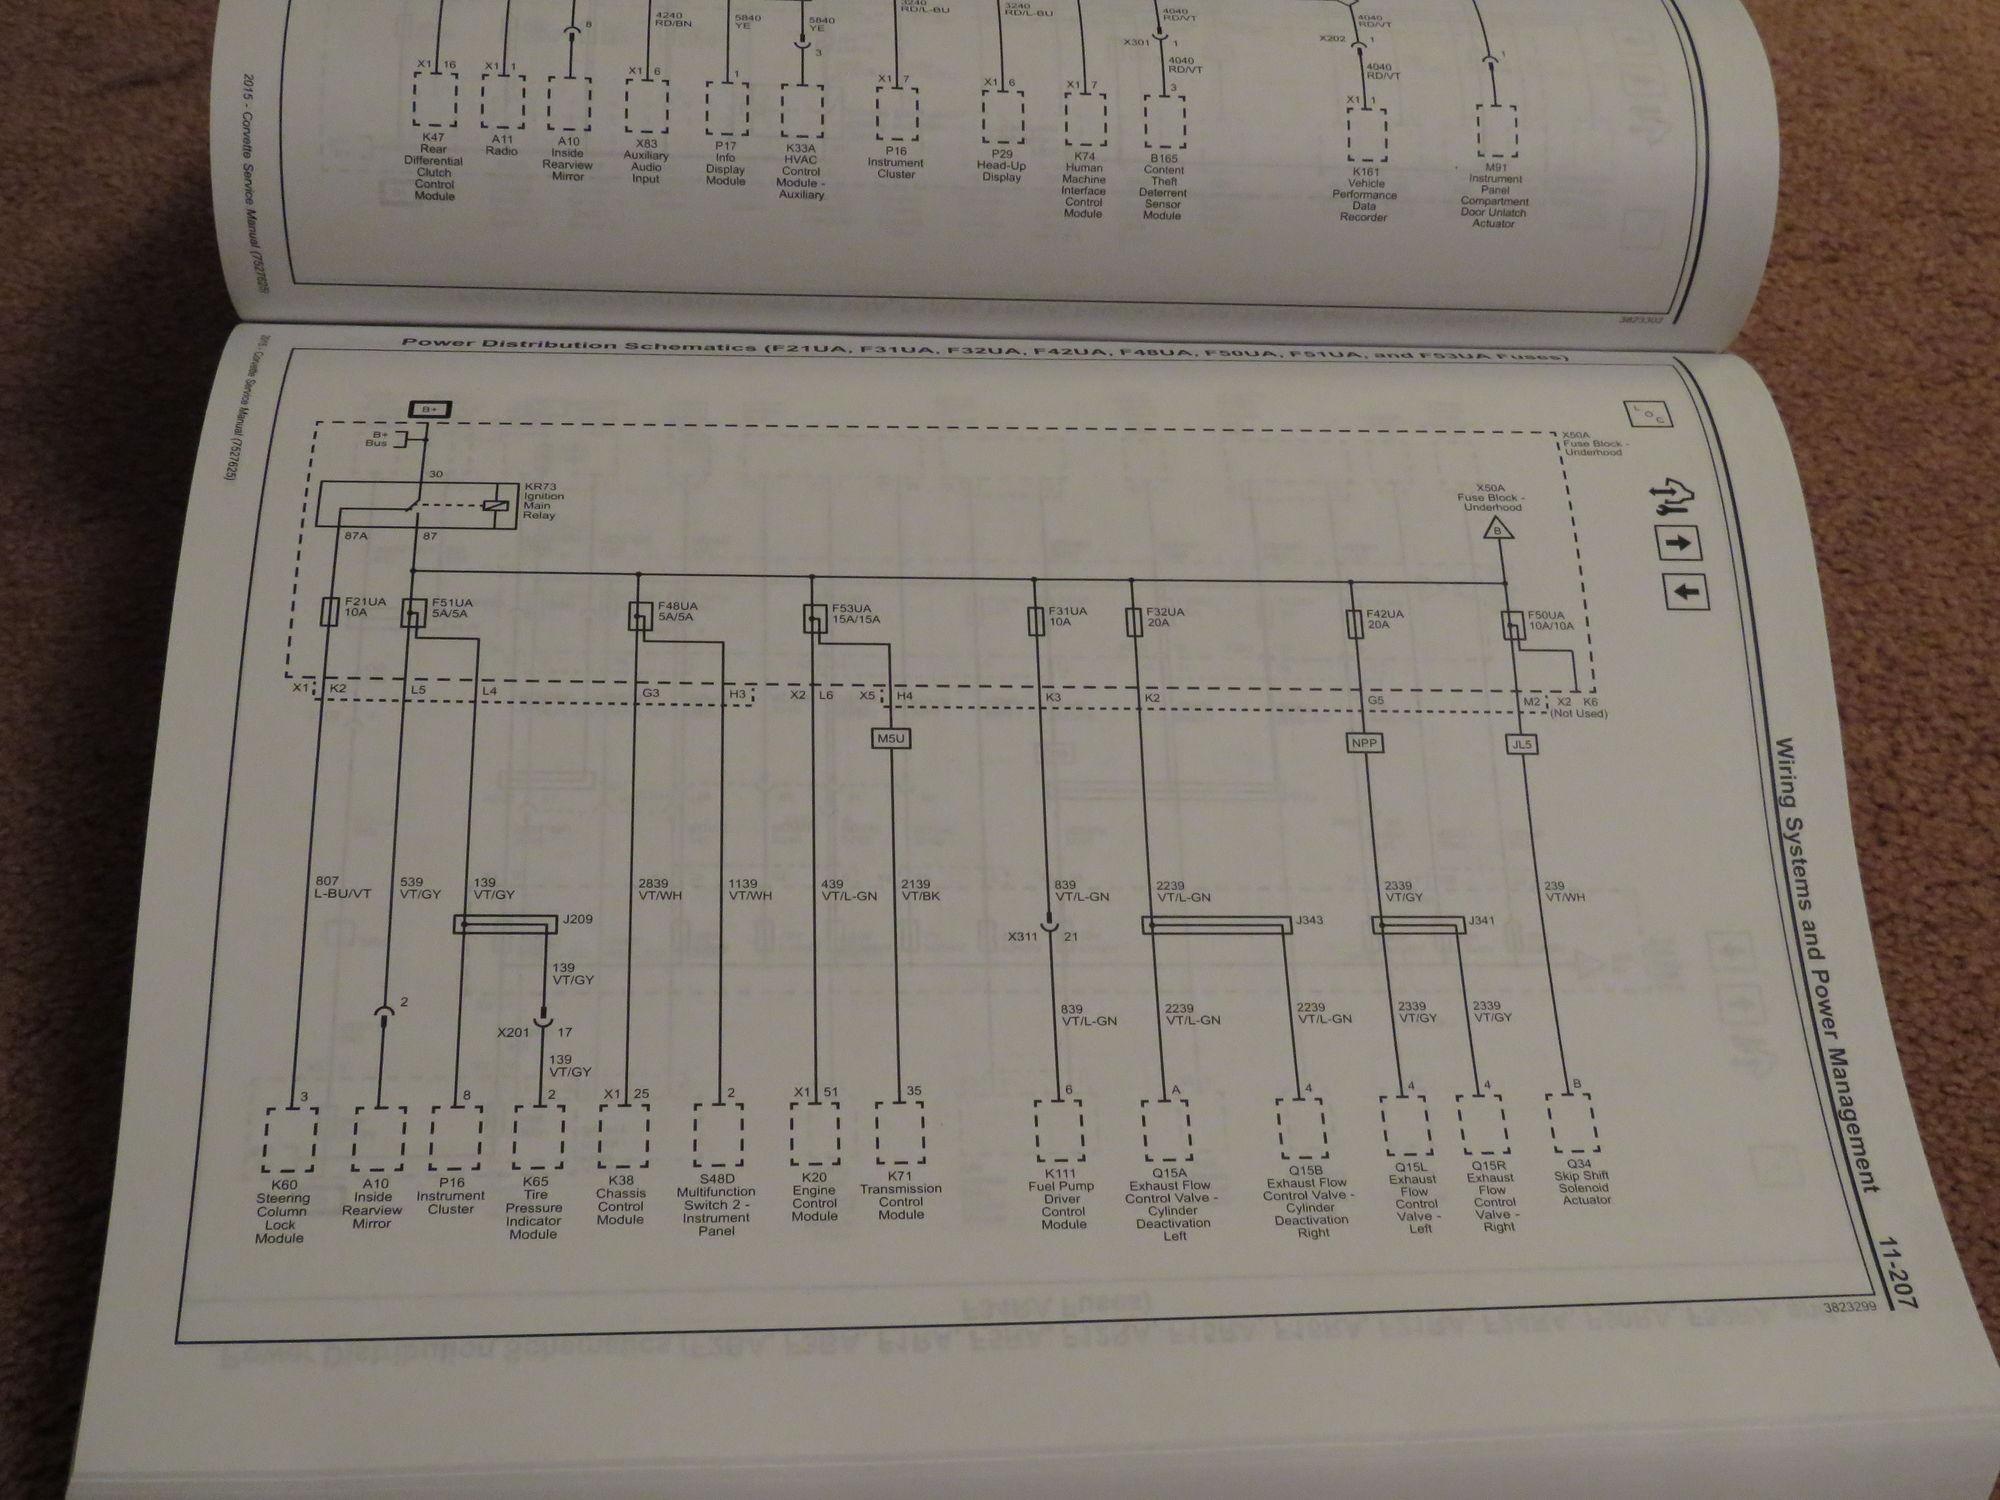 2015 service manual from helm inc corvetteforum chevrolet rh corvetteforum com helminc owners manual Parts Manual